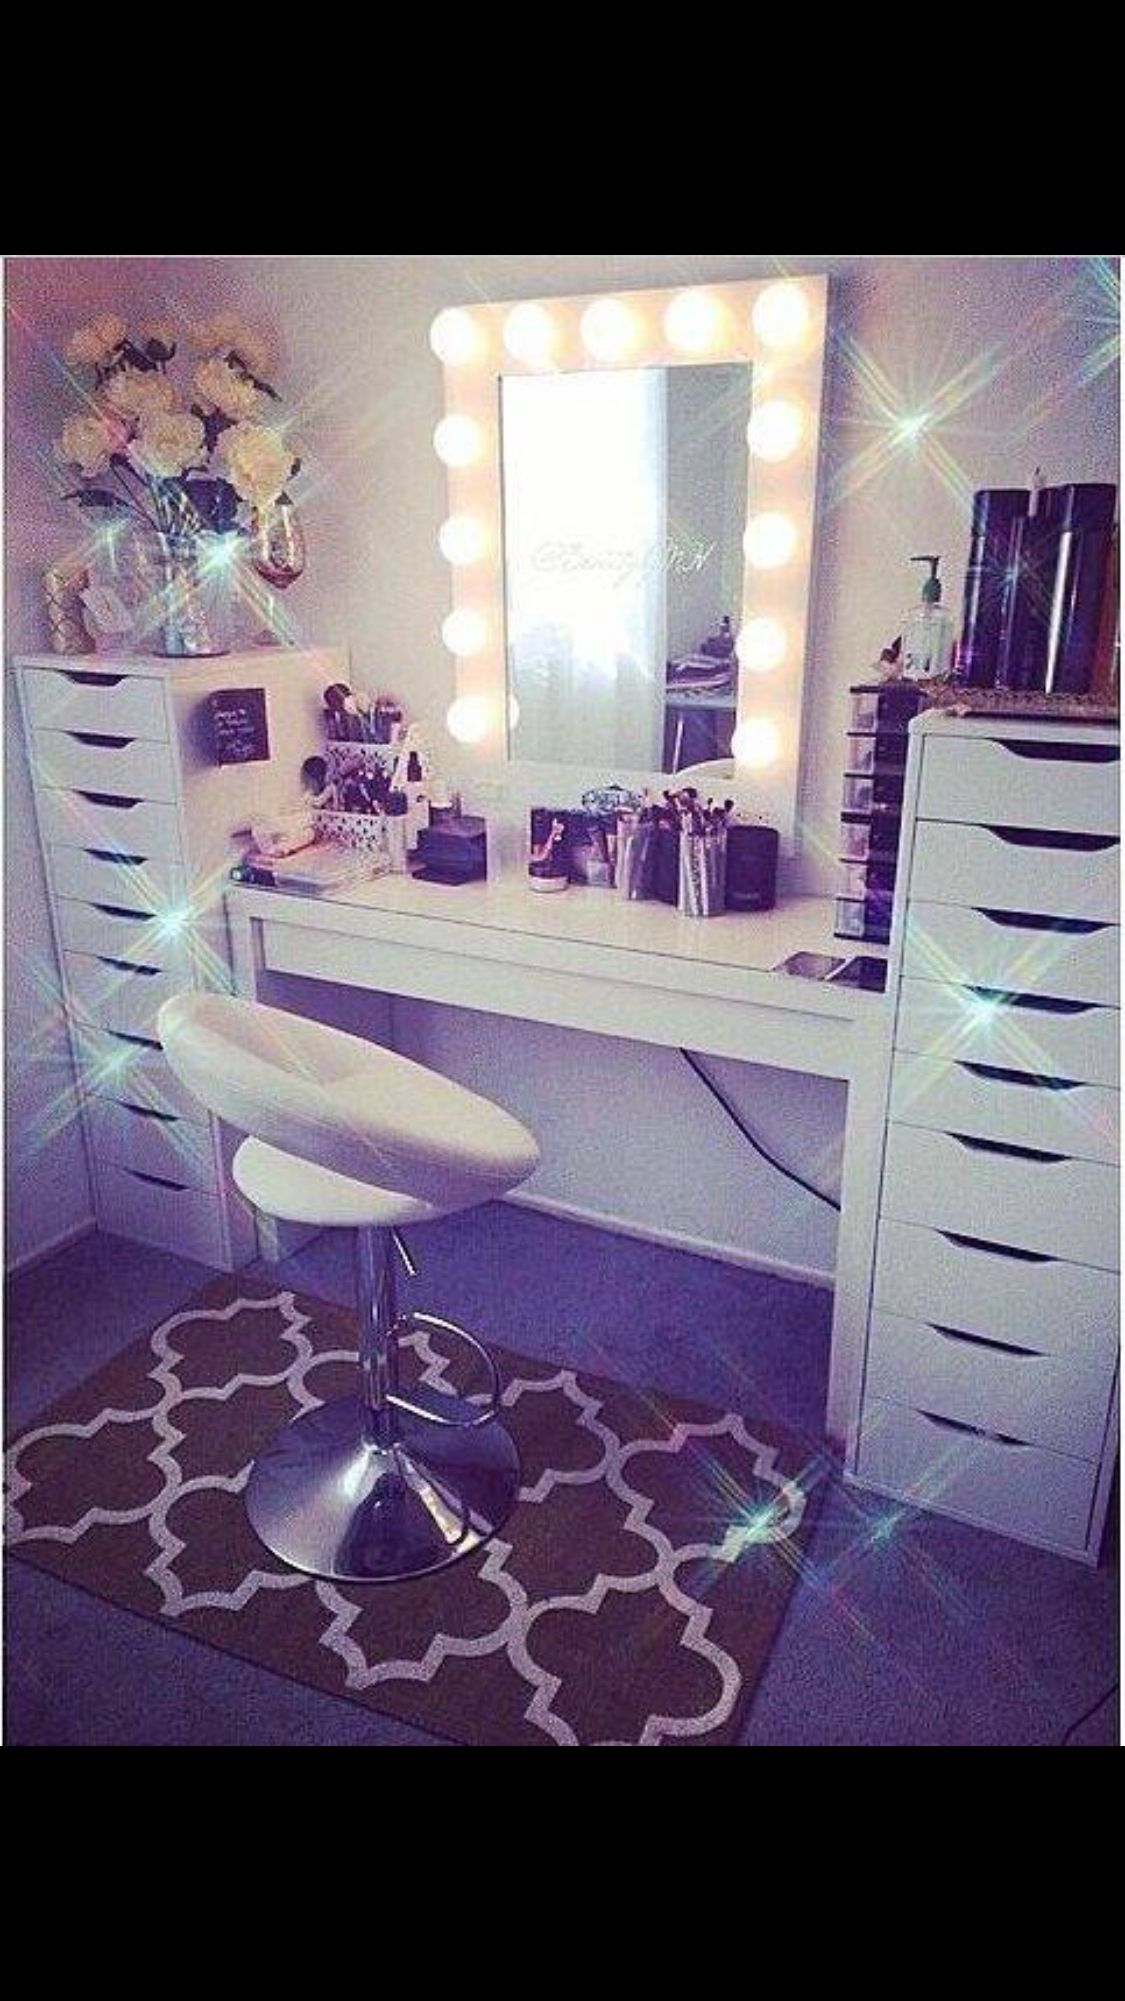 pharmacy set desk and linon ikea diy led vanities table lighted bedroom vanity harper on pinterest makeup mirror with best adjustable ideas lights light